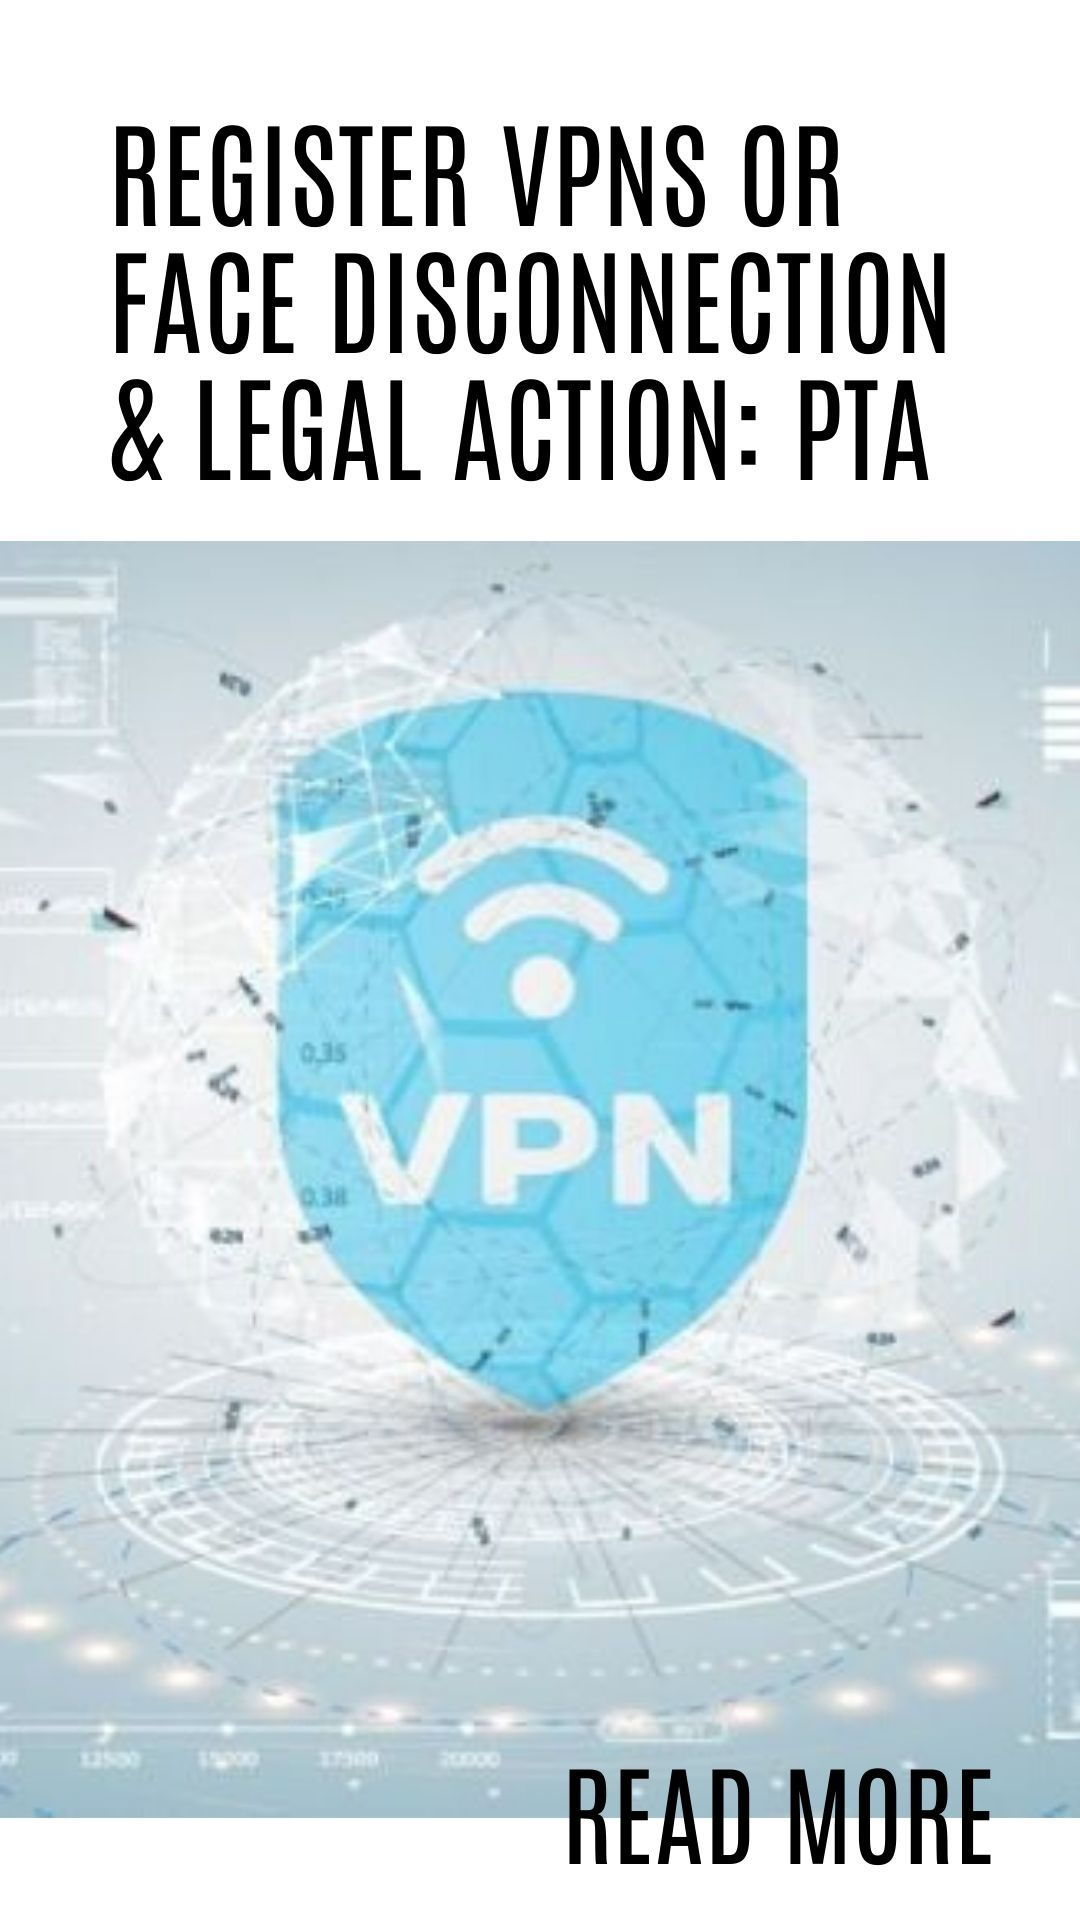 7b7f6ad59b9ea8d2febf502065d078dc - Is It Illegal To Use A Vpn